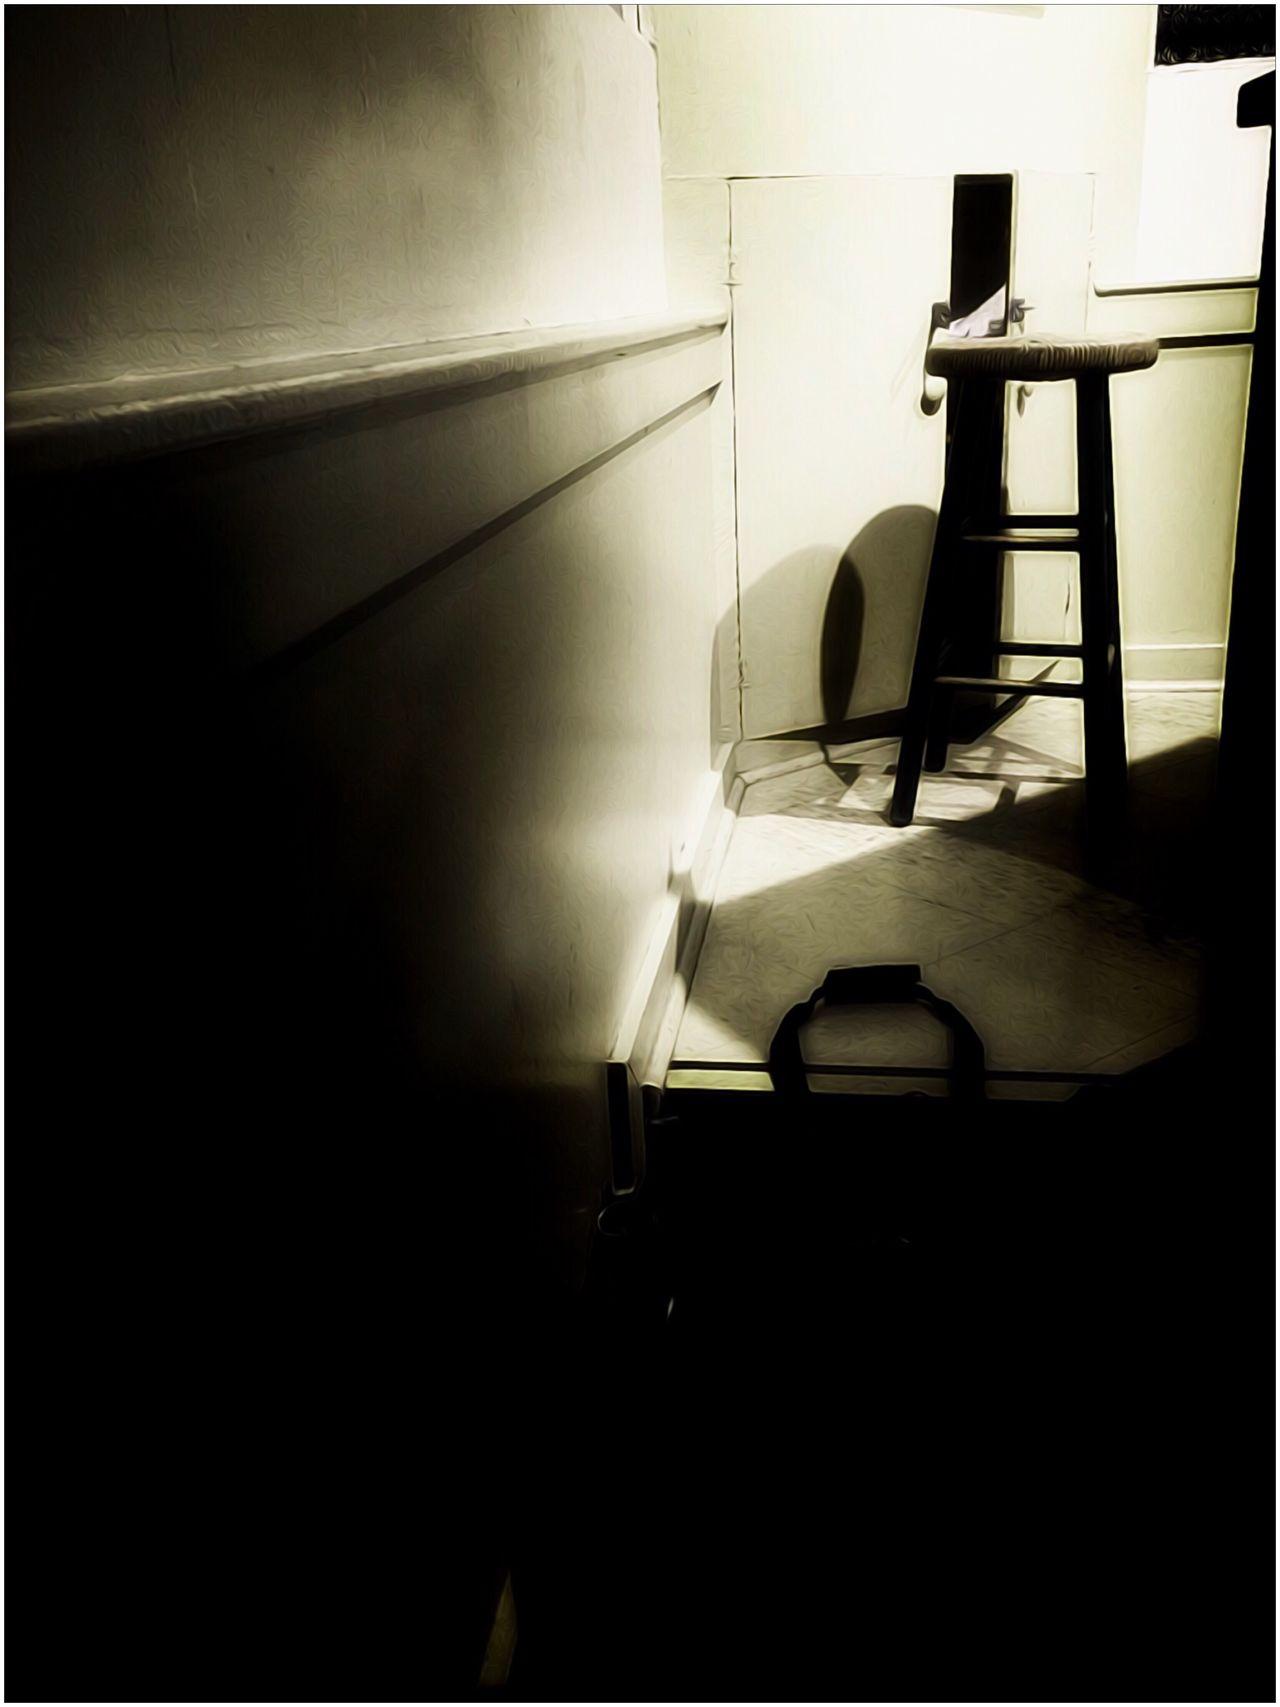 Meeting Hall Stool Black And White Photography Blackandwhite Light And Shadow Lightanddark Indoors  Interior Meetinghall Still Life